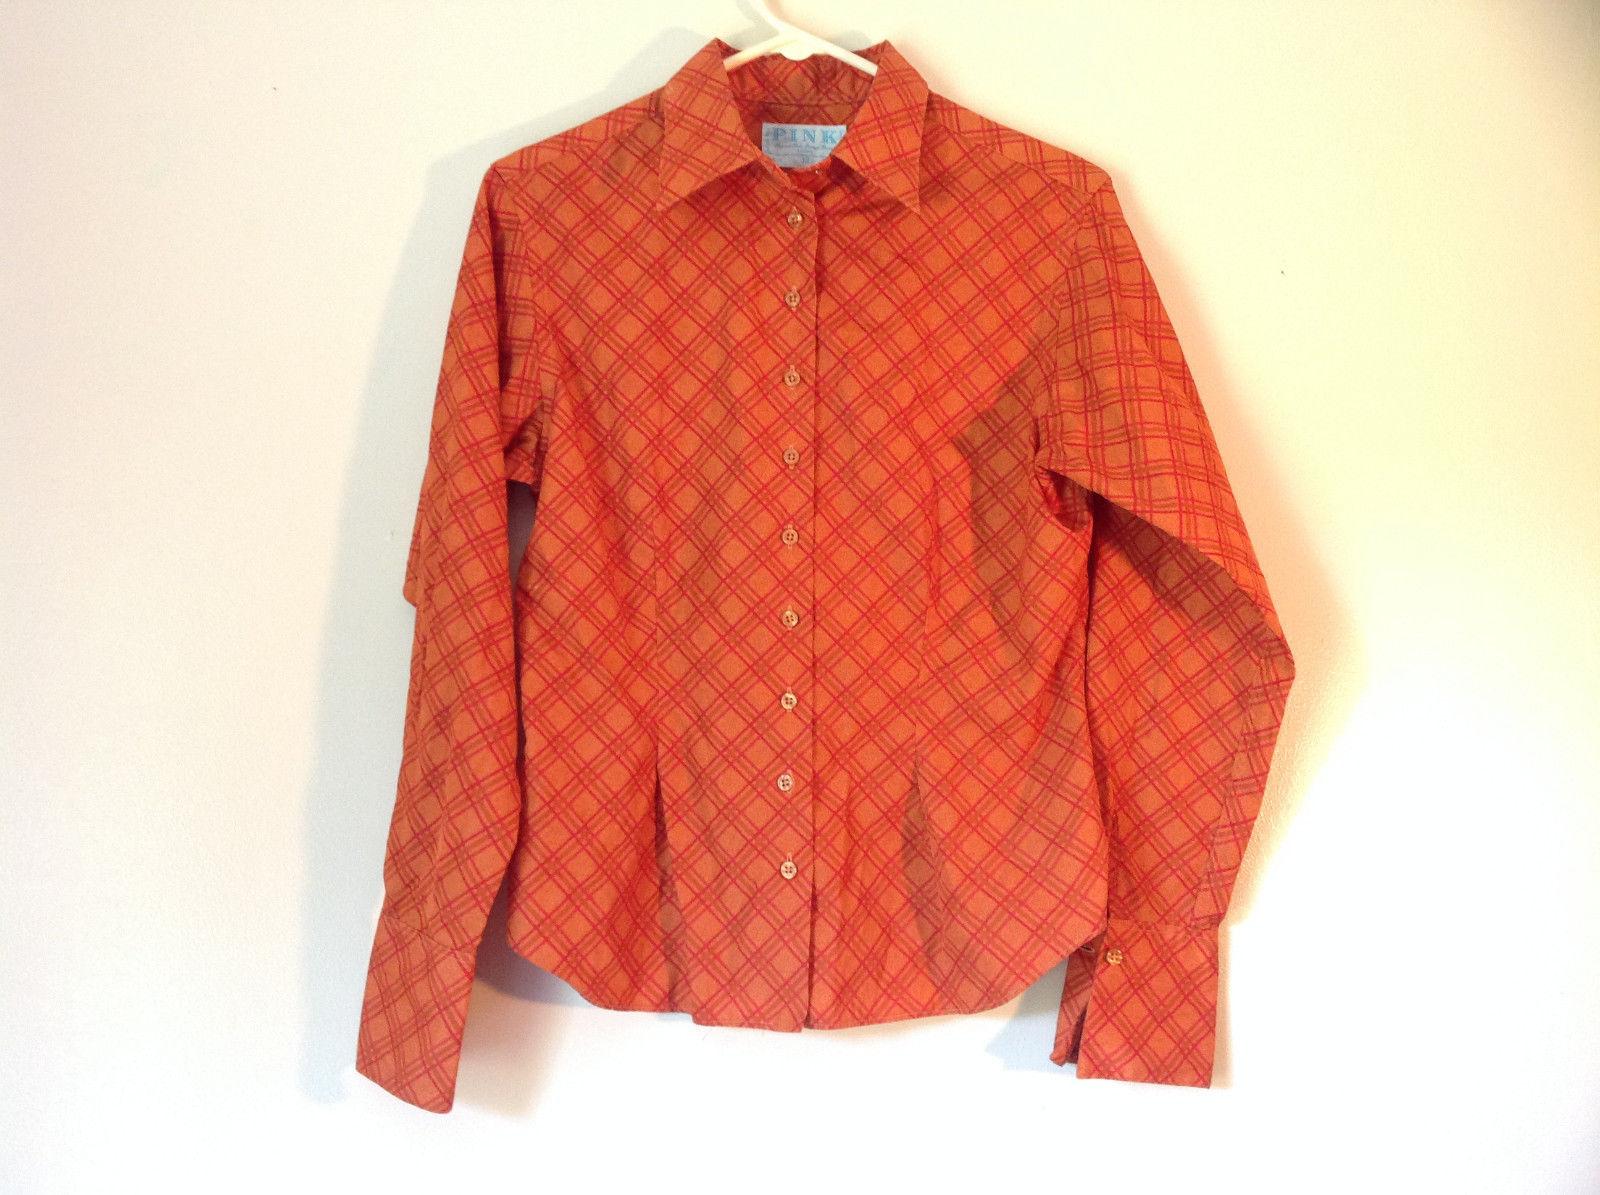 Thomas Pink Luxury Designer Shirt Orange Diamond Pattern Size US 10